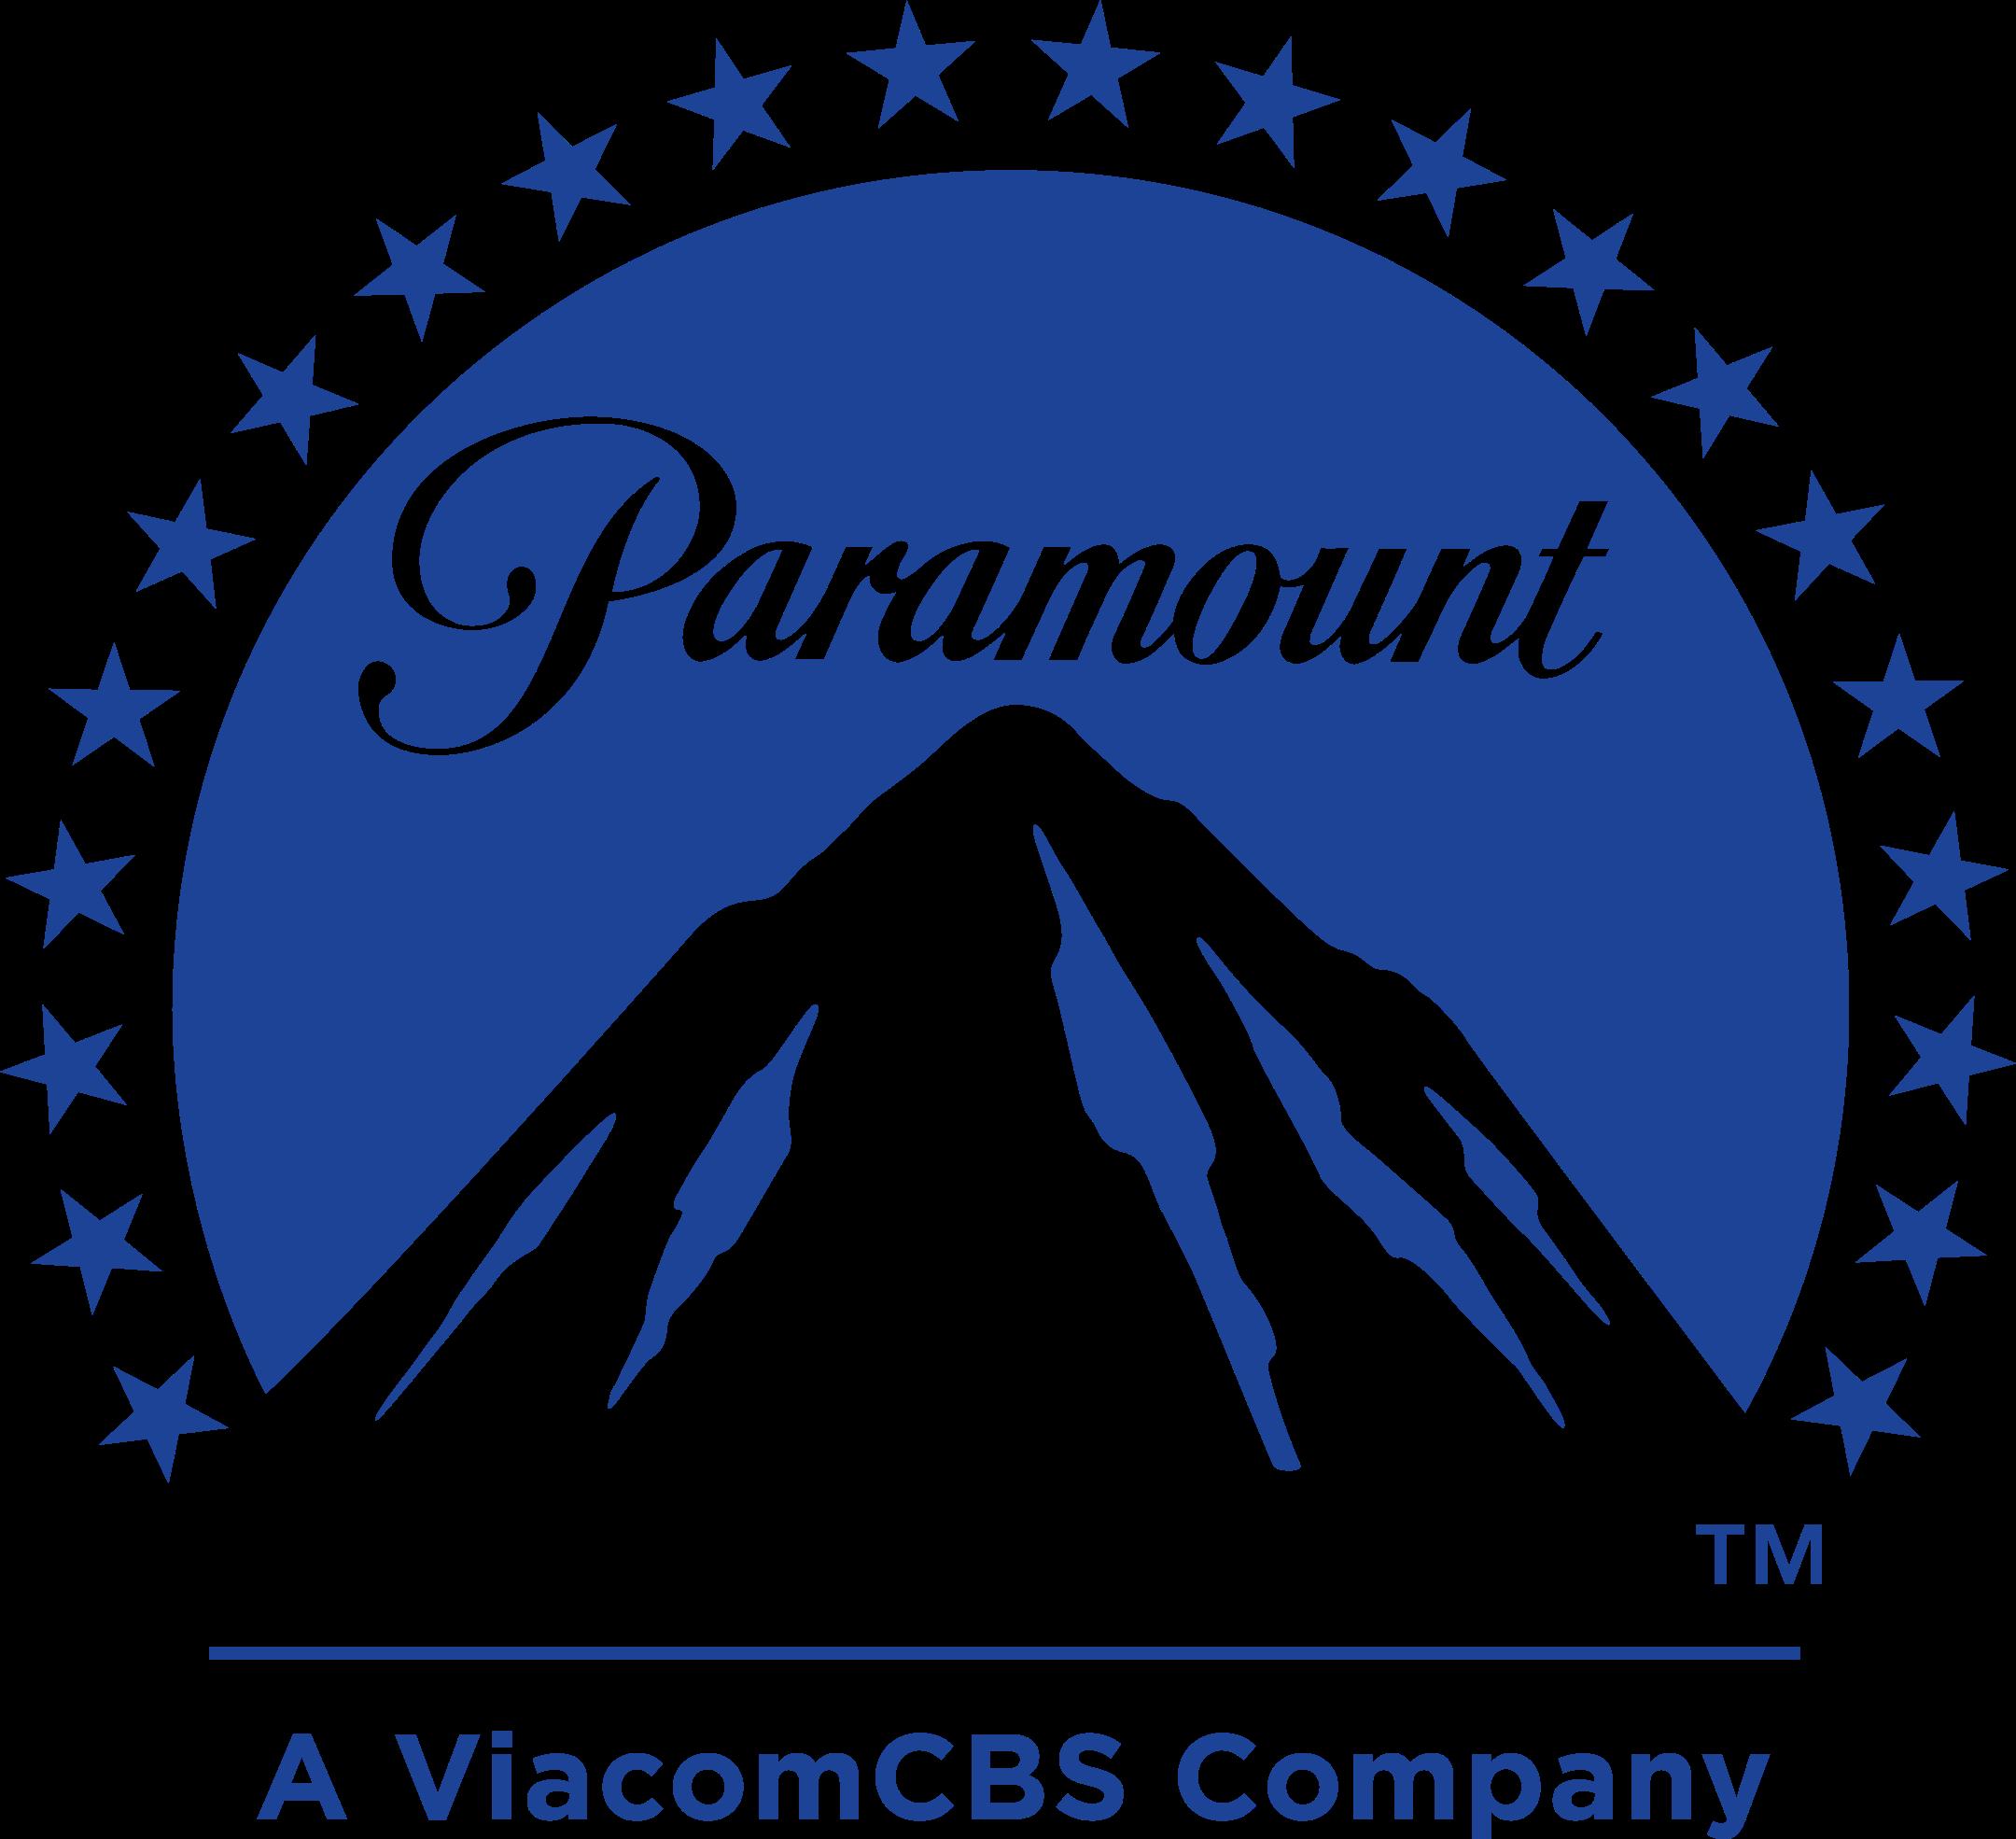 paramount logo 1 1 - Paramount Logo